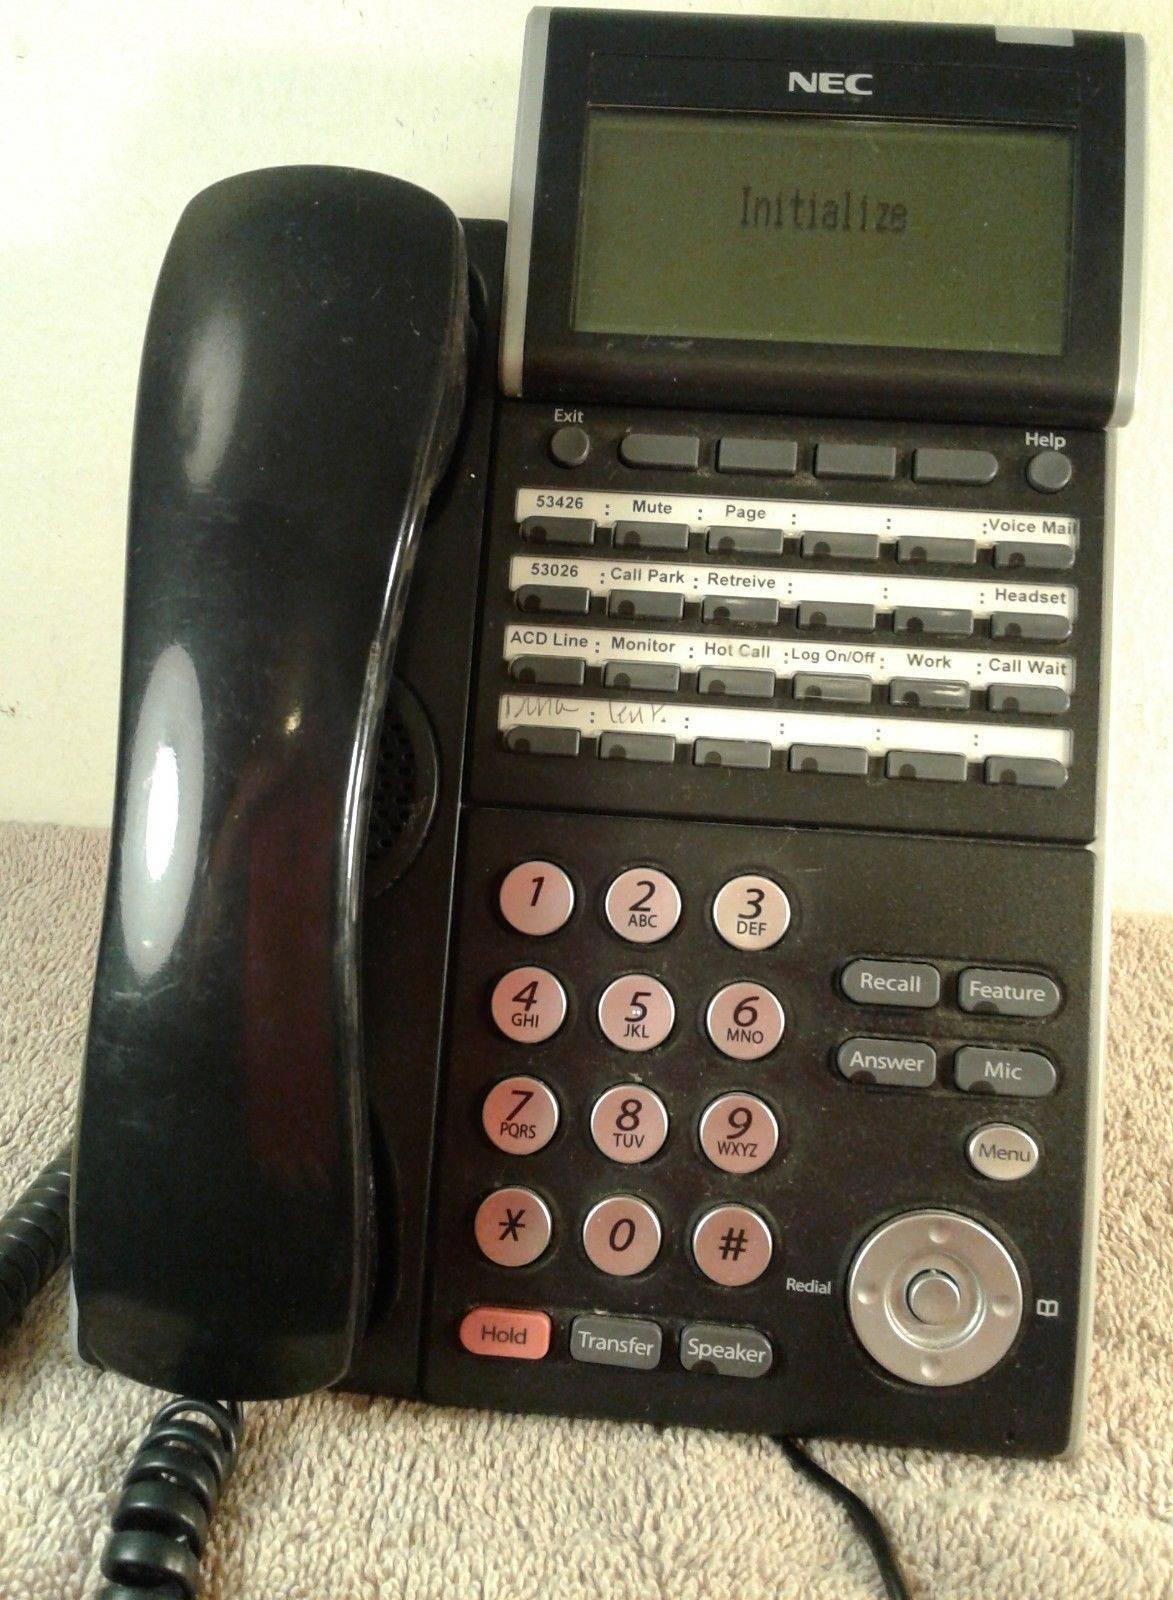 Nec Sl1100 Phone Label Template